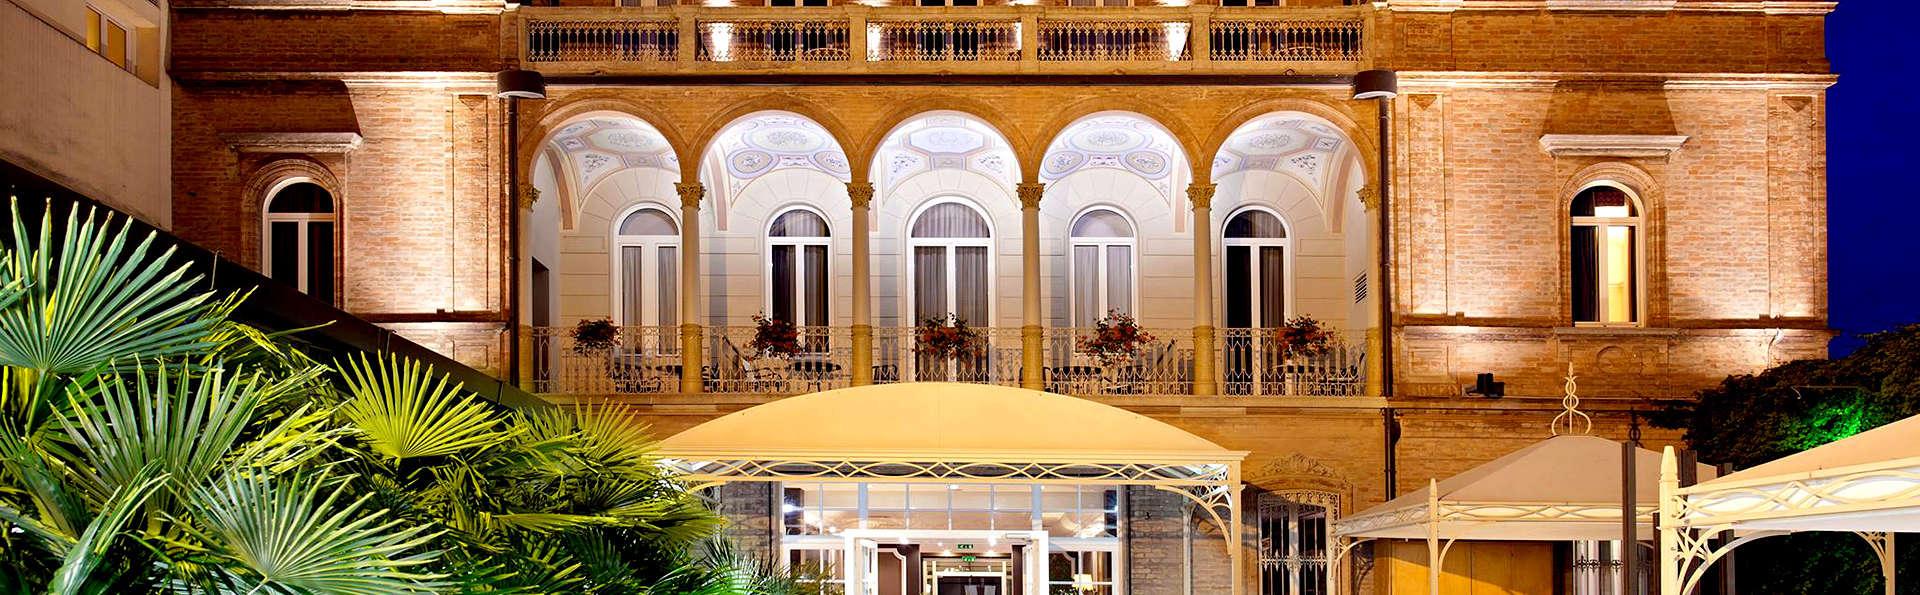 Hotel Villa Adriatica - Edit_Front.jpg